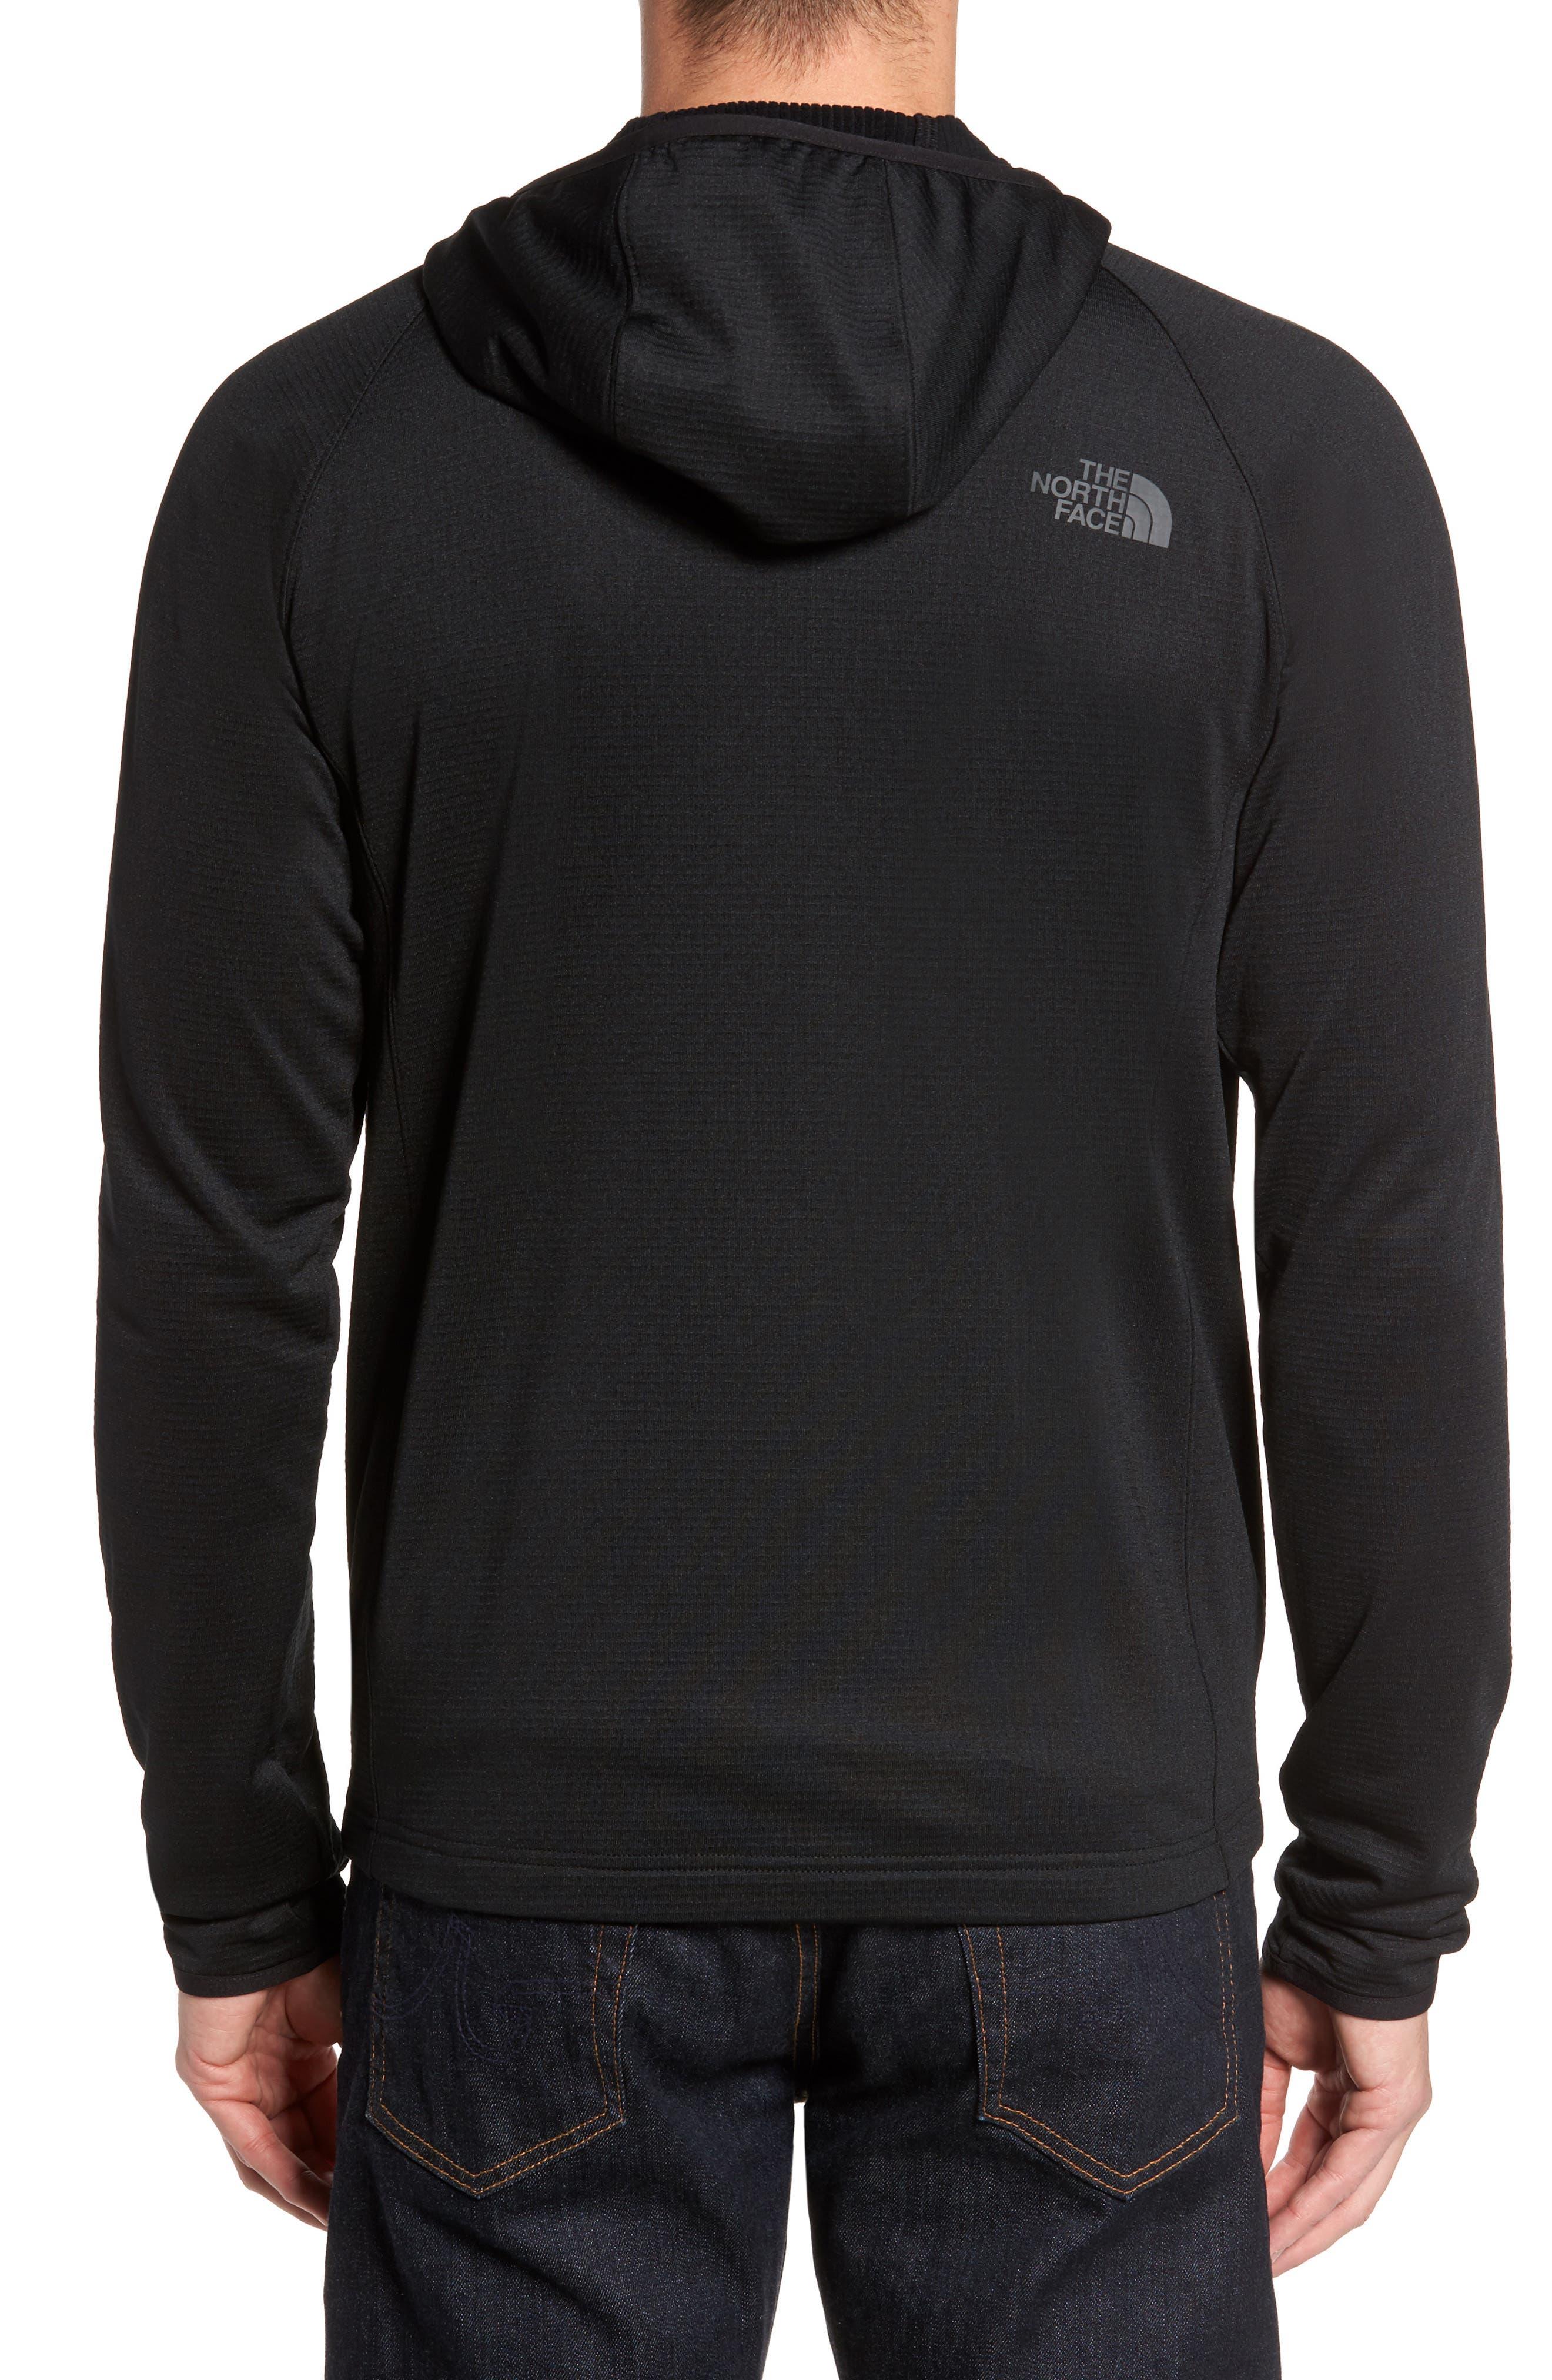 Borod Zip Fleece Jacket,                             Alternate thumbnail 2, color,                             BLACK/ BLACK